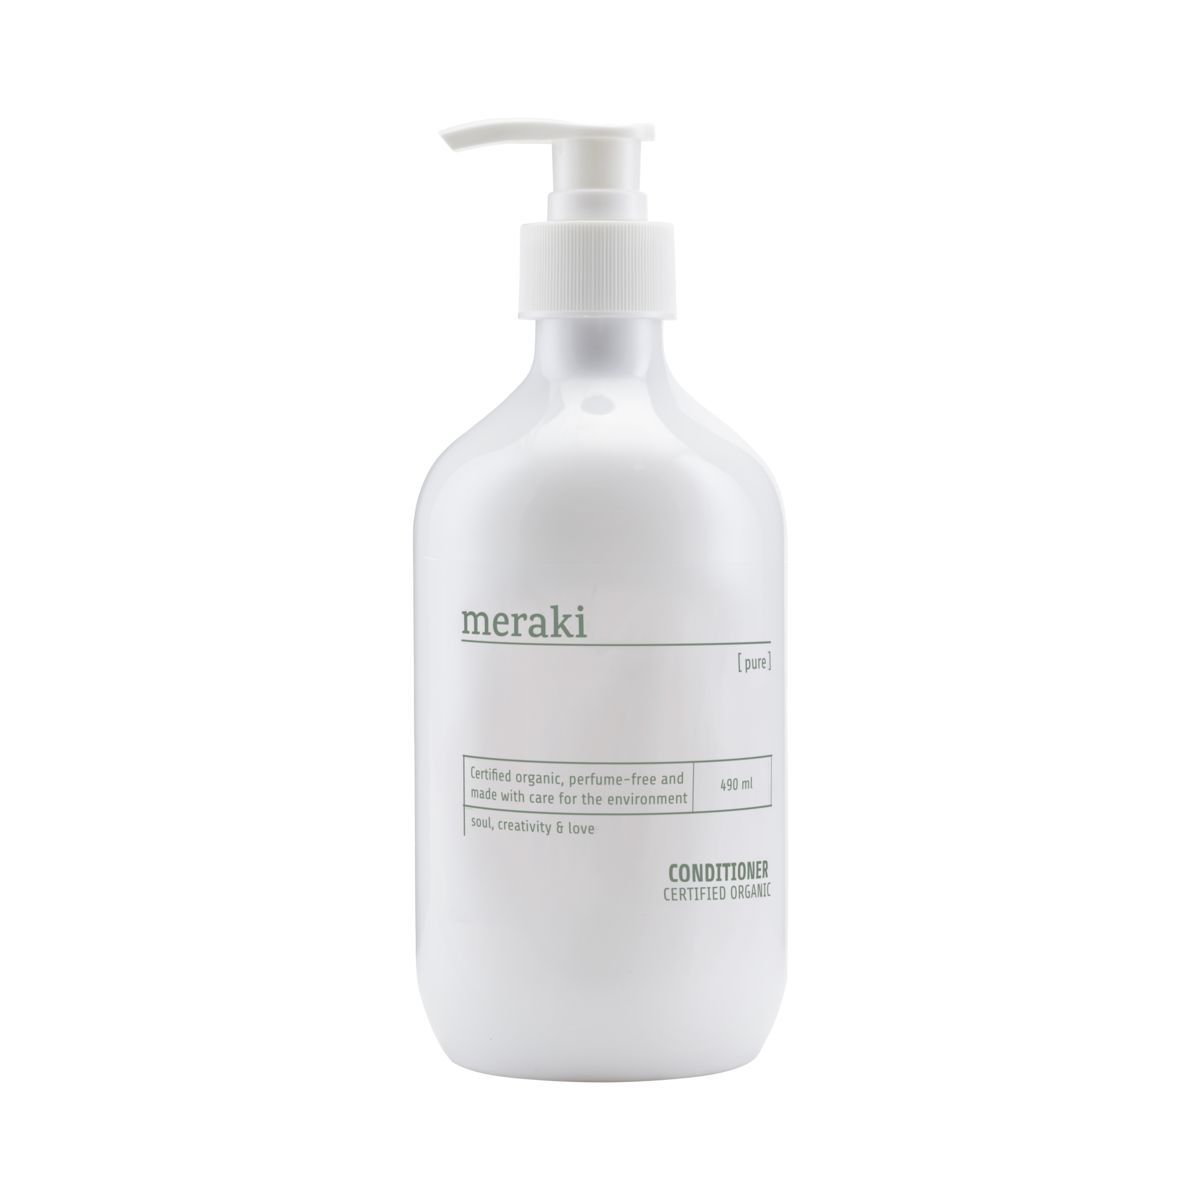 Meraki - Balsam - Pure